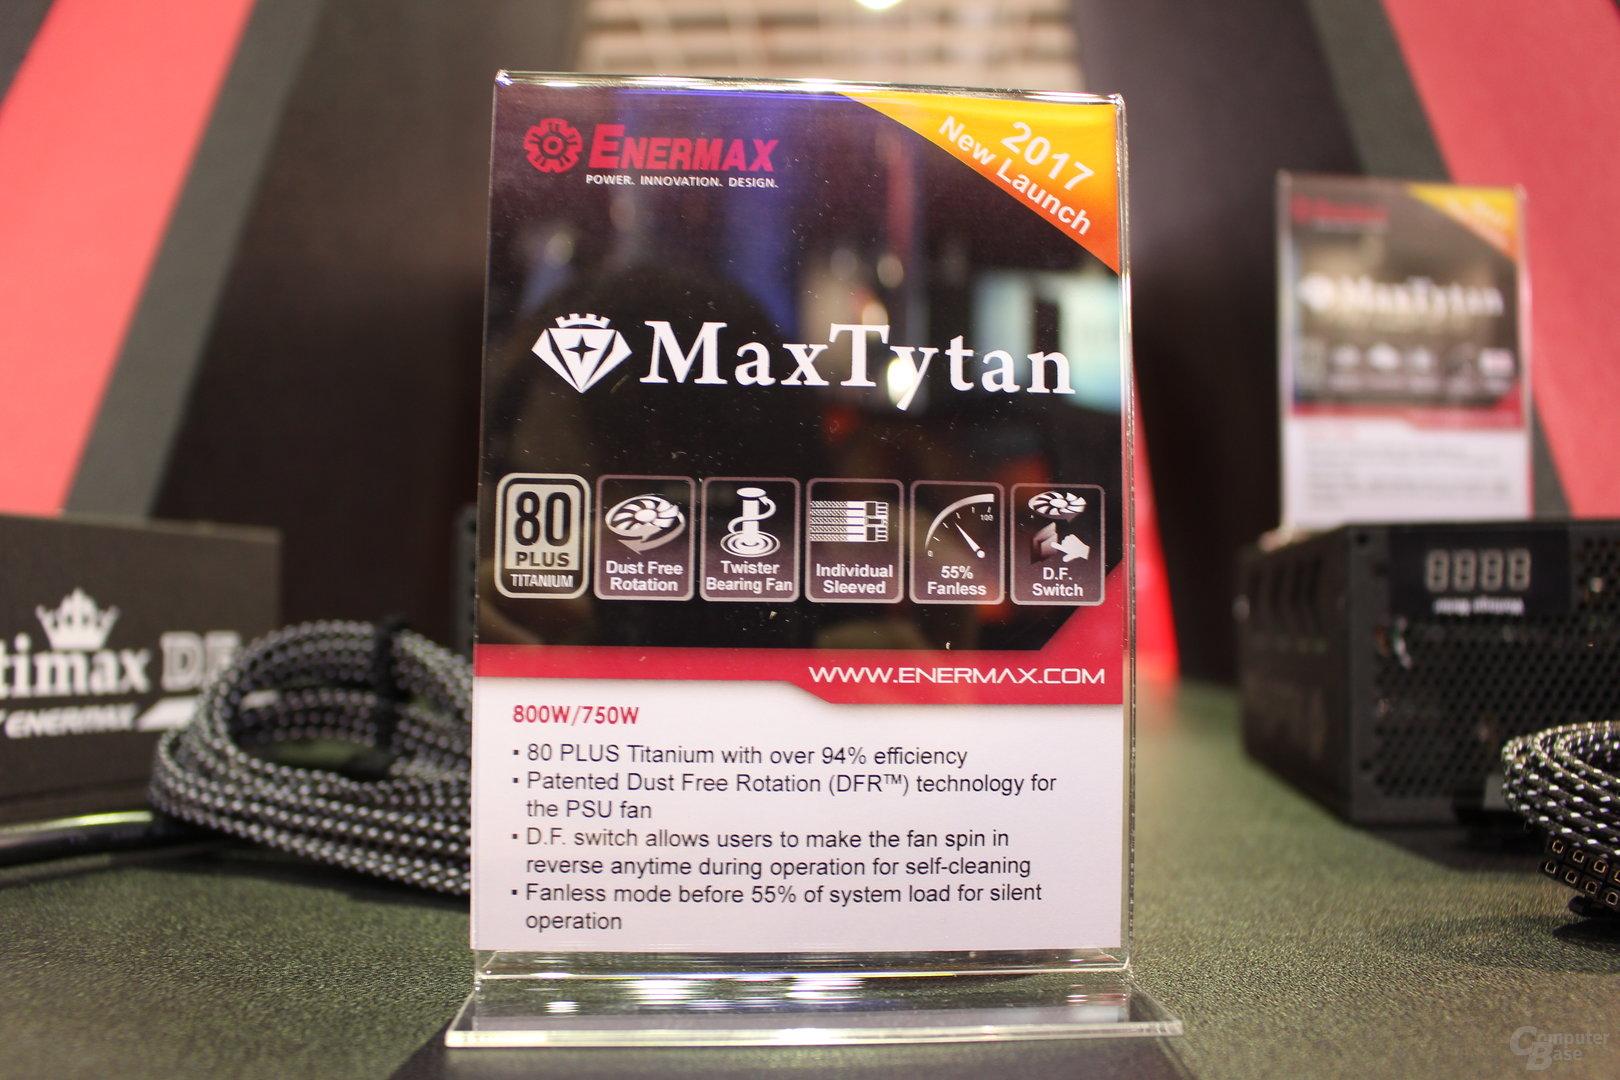 Enermax MaxTytan